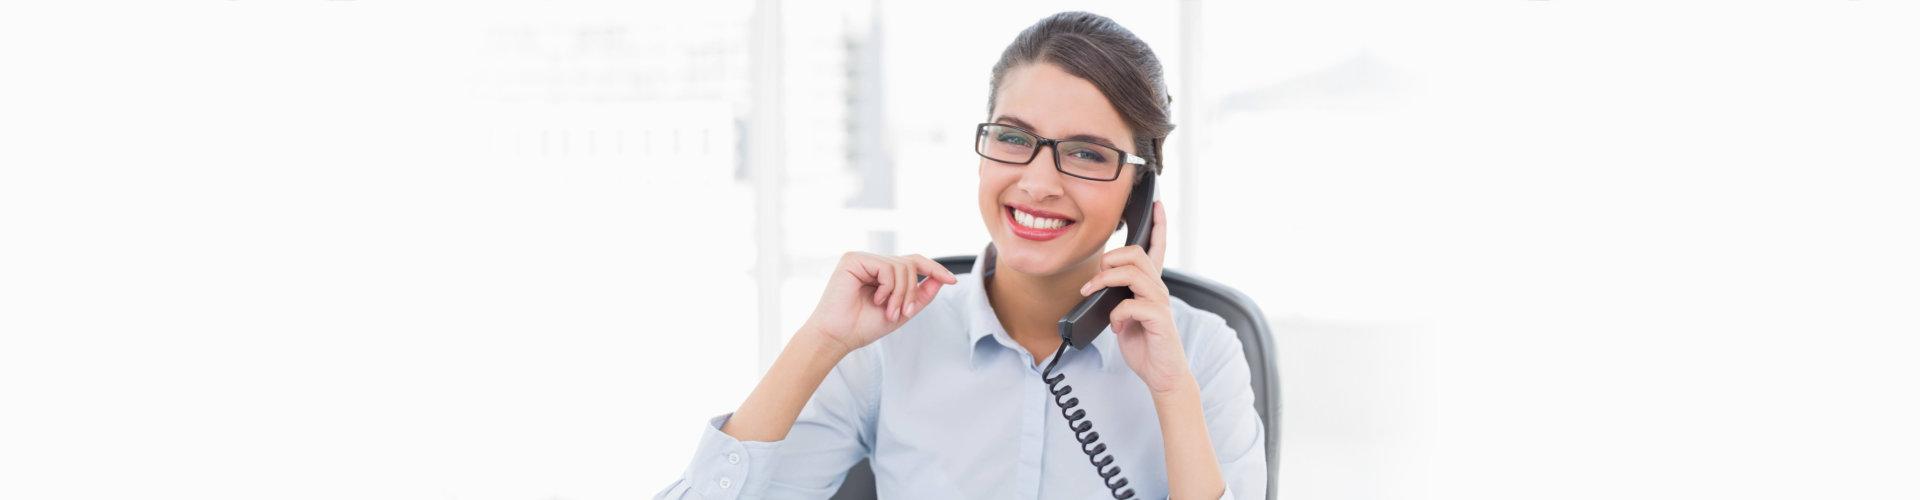 woman using telephone